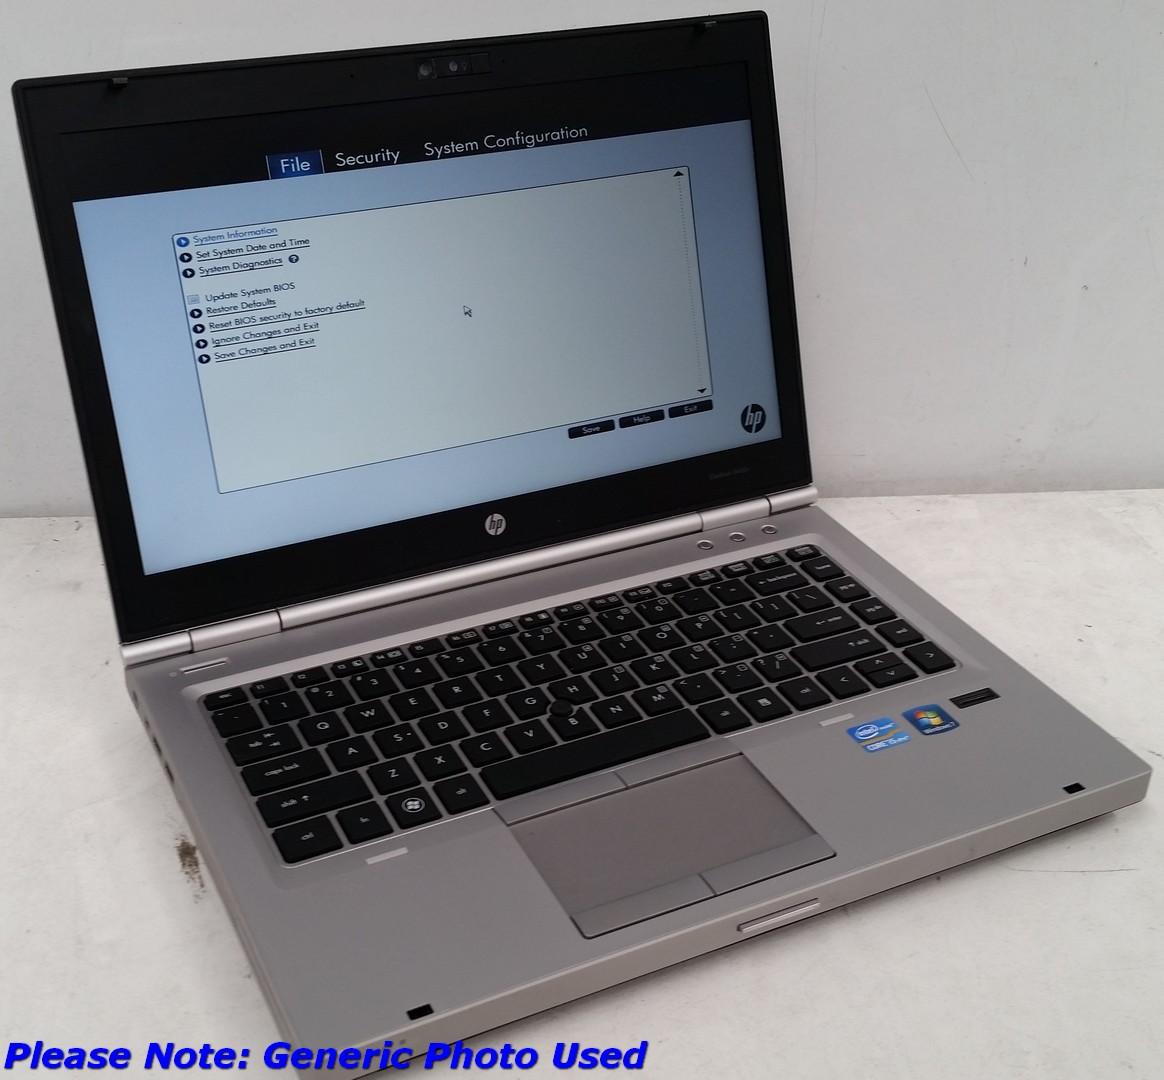 Hp Elitebook 8460p 13 3 Inch Widescreen Core i5 -2540M Mobile 2 6GHz Laptop